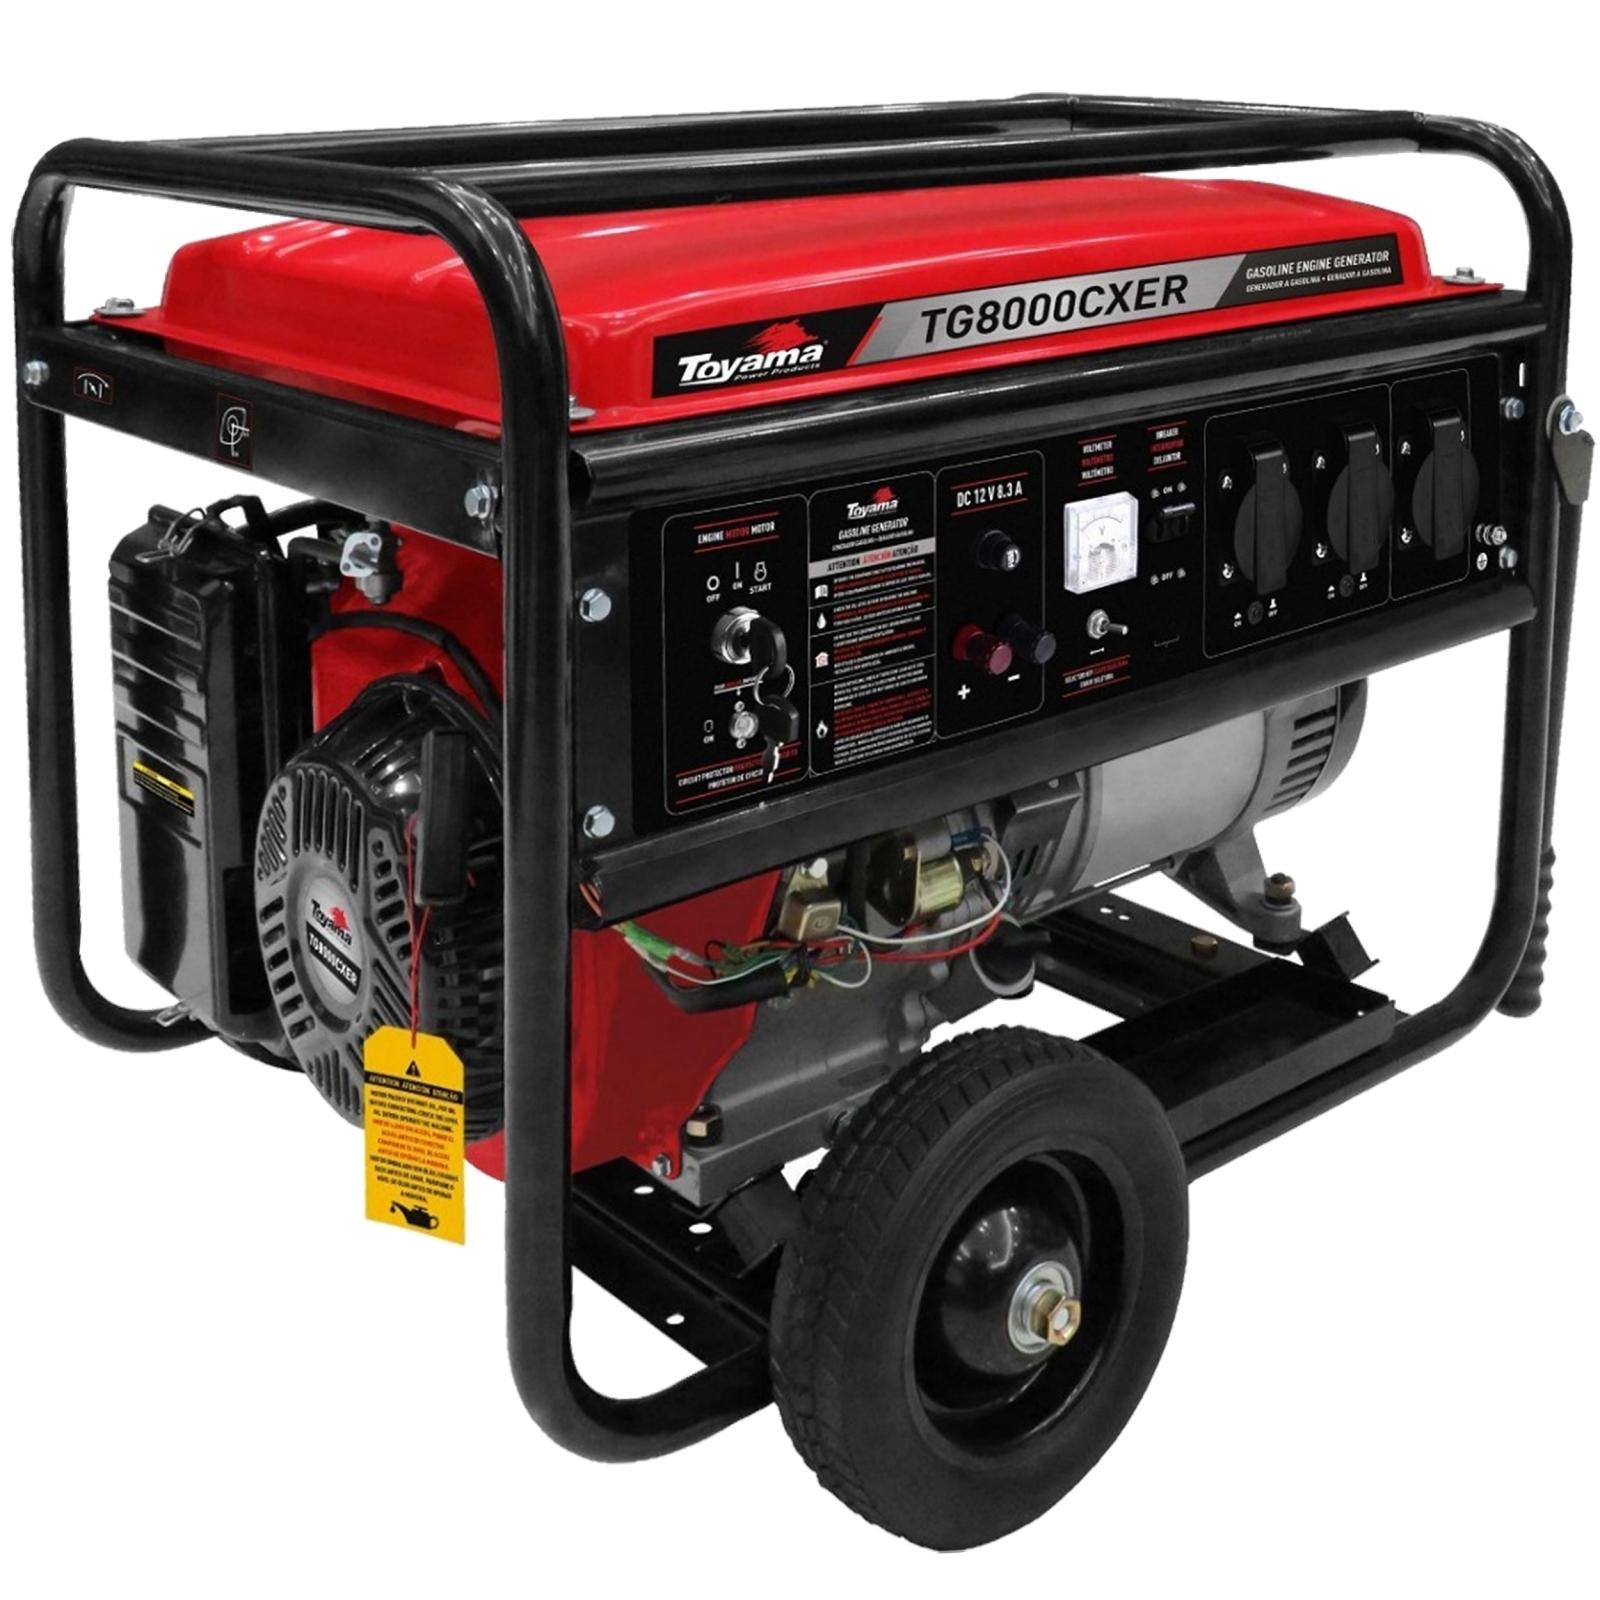 Gerador De Energia À Gasolina 7,2 Kva  Toyama TG8000CXER - Ferramentas MEP